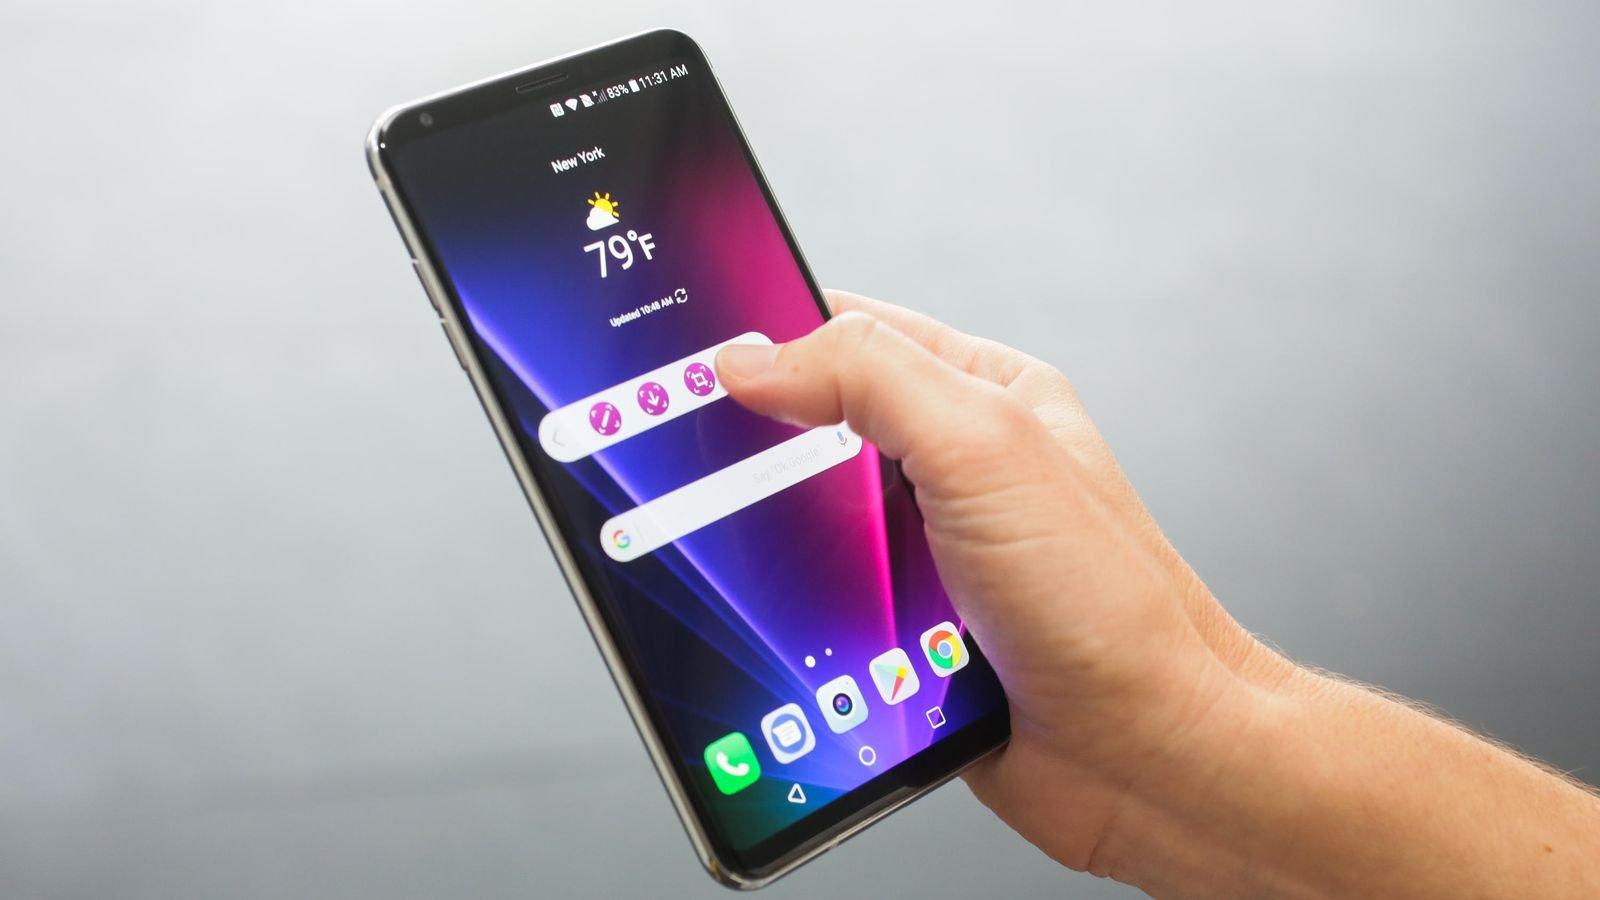 LGпредставит смартфон счипсетом Snapdragon 845 летом 2018 года